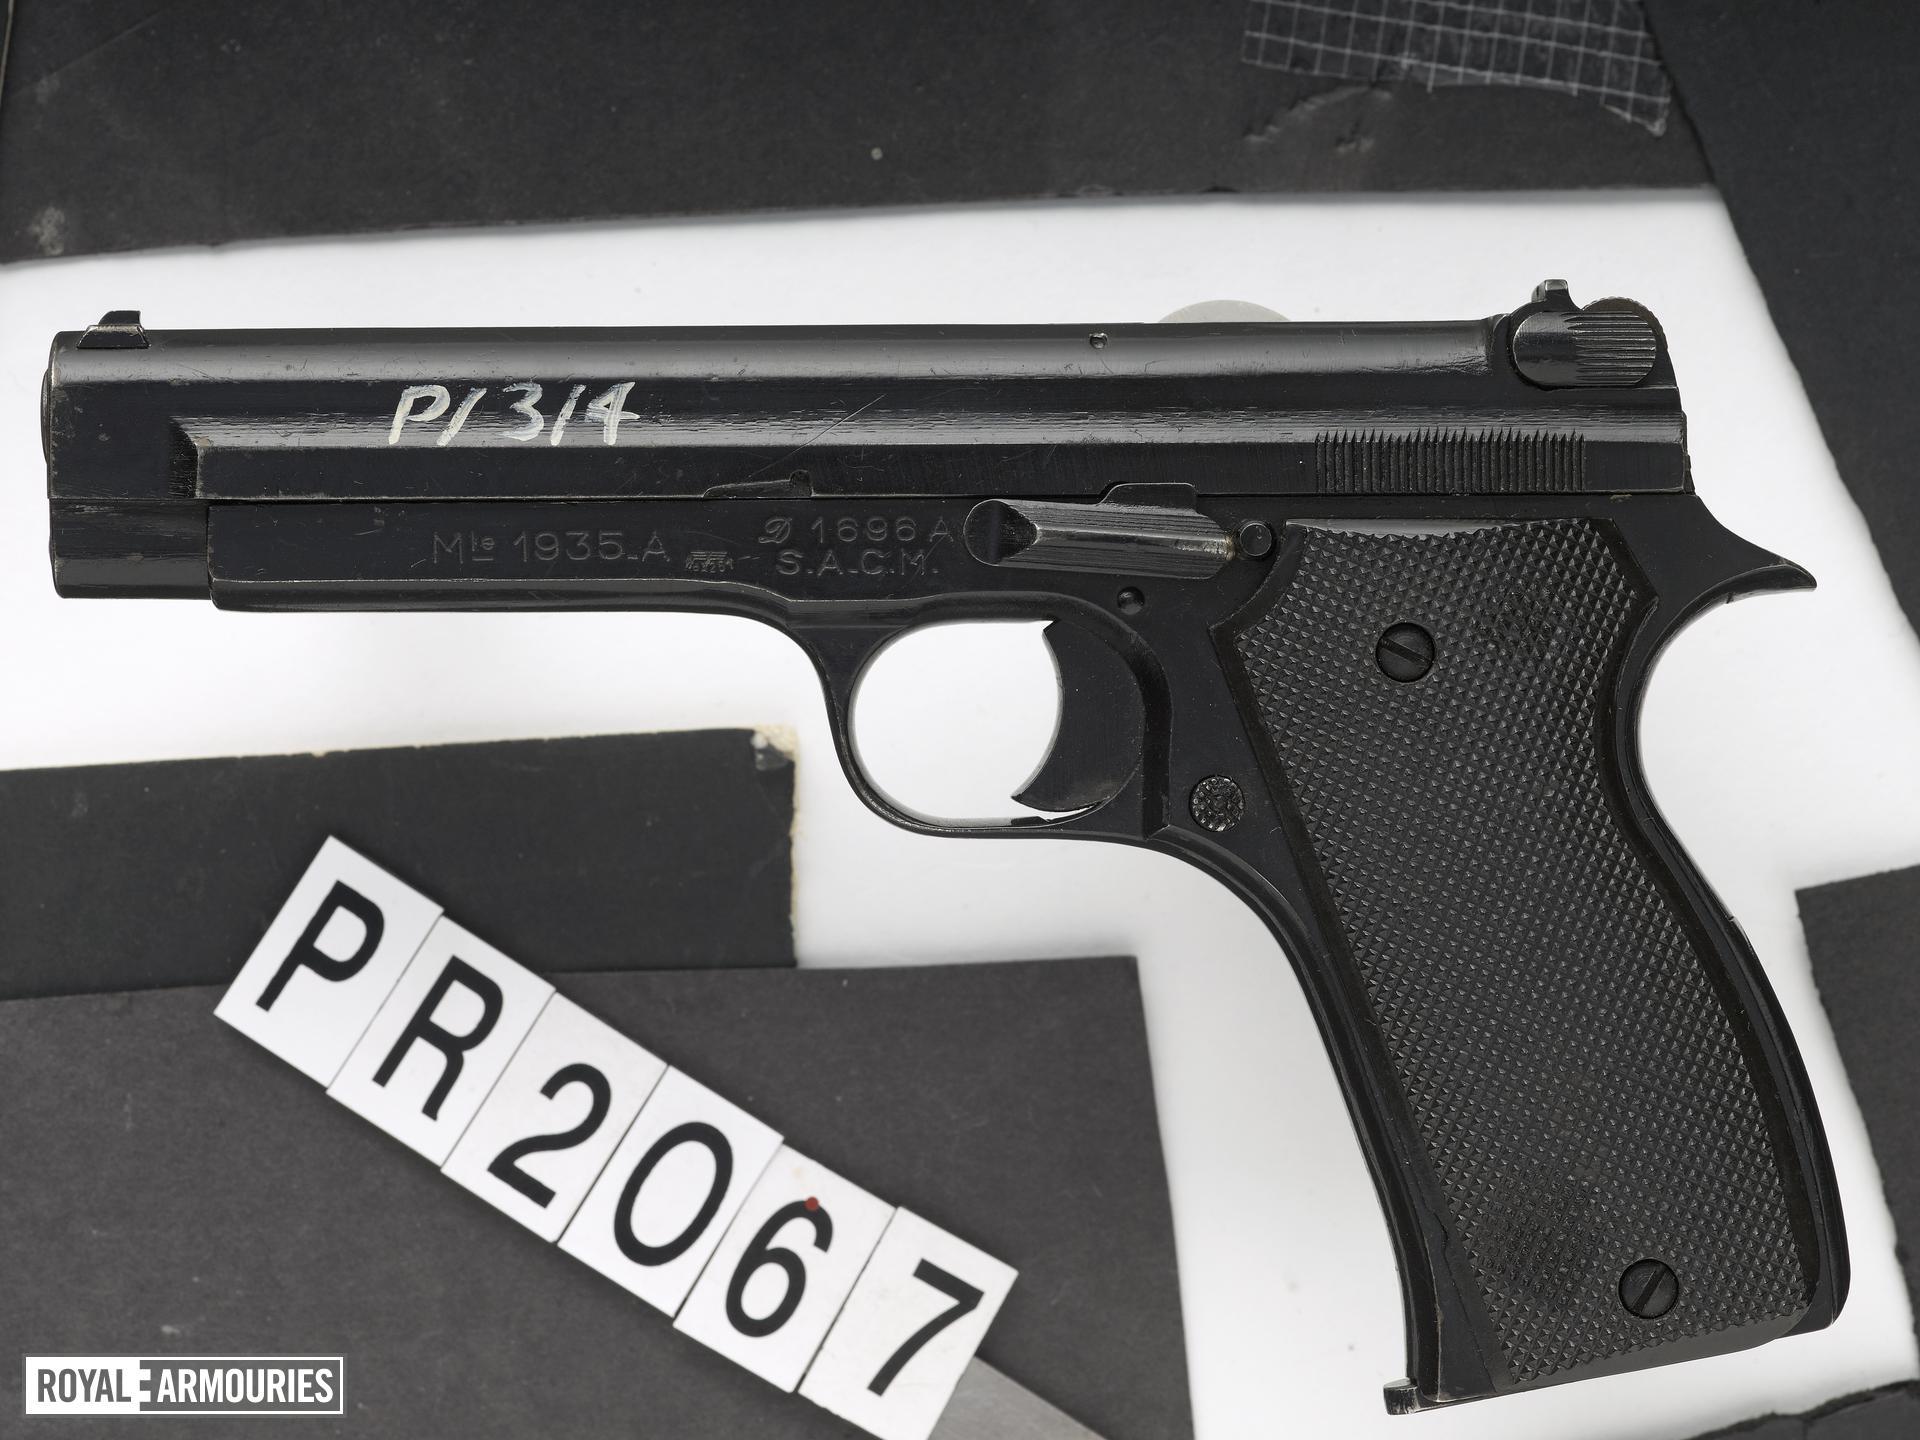 Centrefire self-loading pistol - SACM Model 1935A